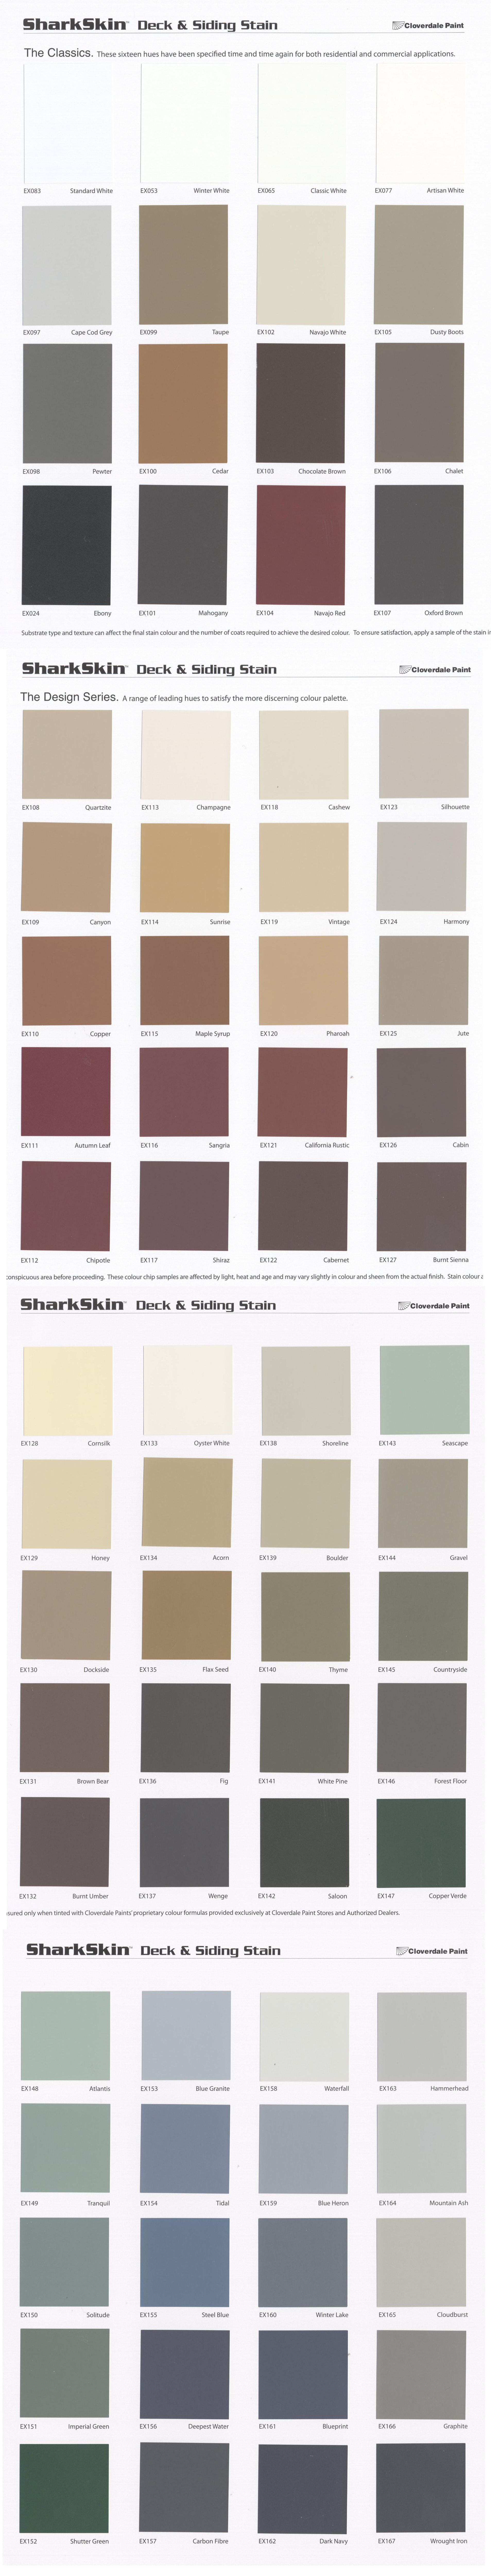 Cloverdale Paint S Shark Skin Deck Colours Madrona Crk